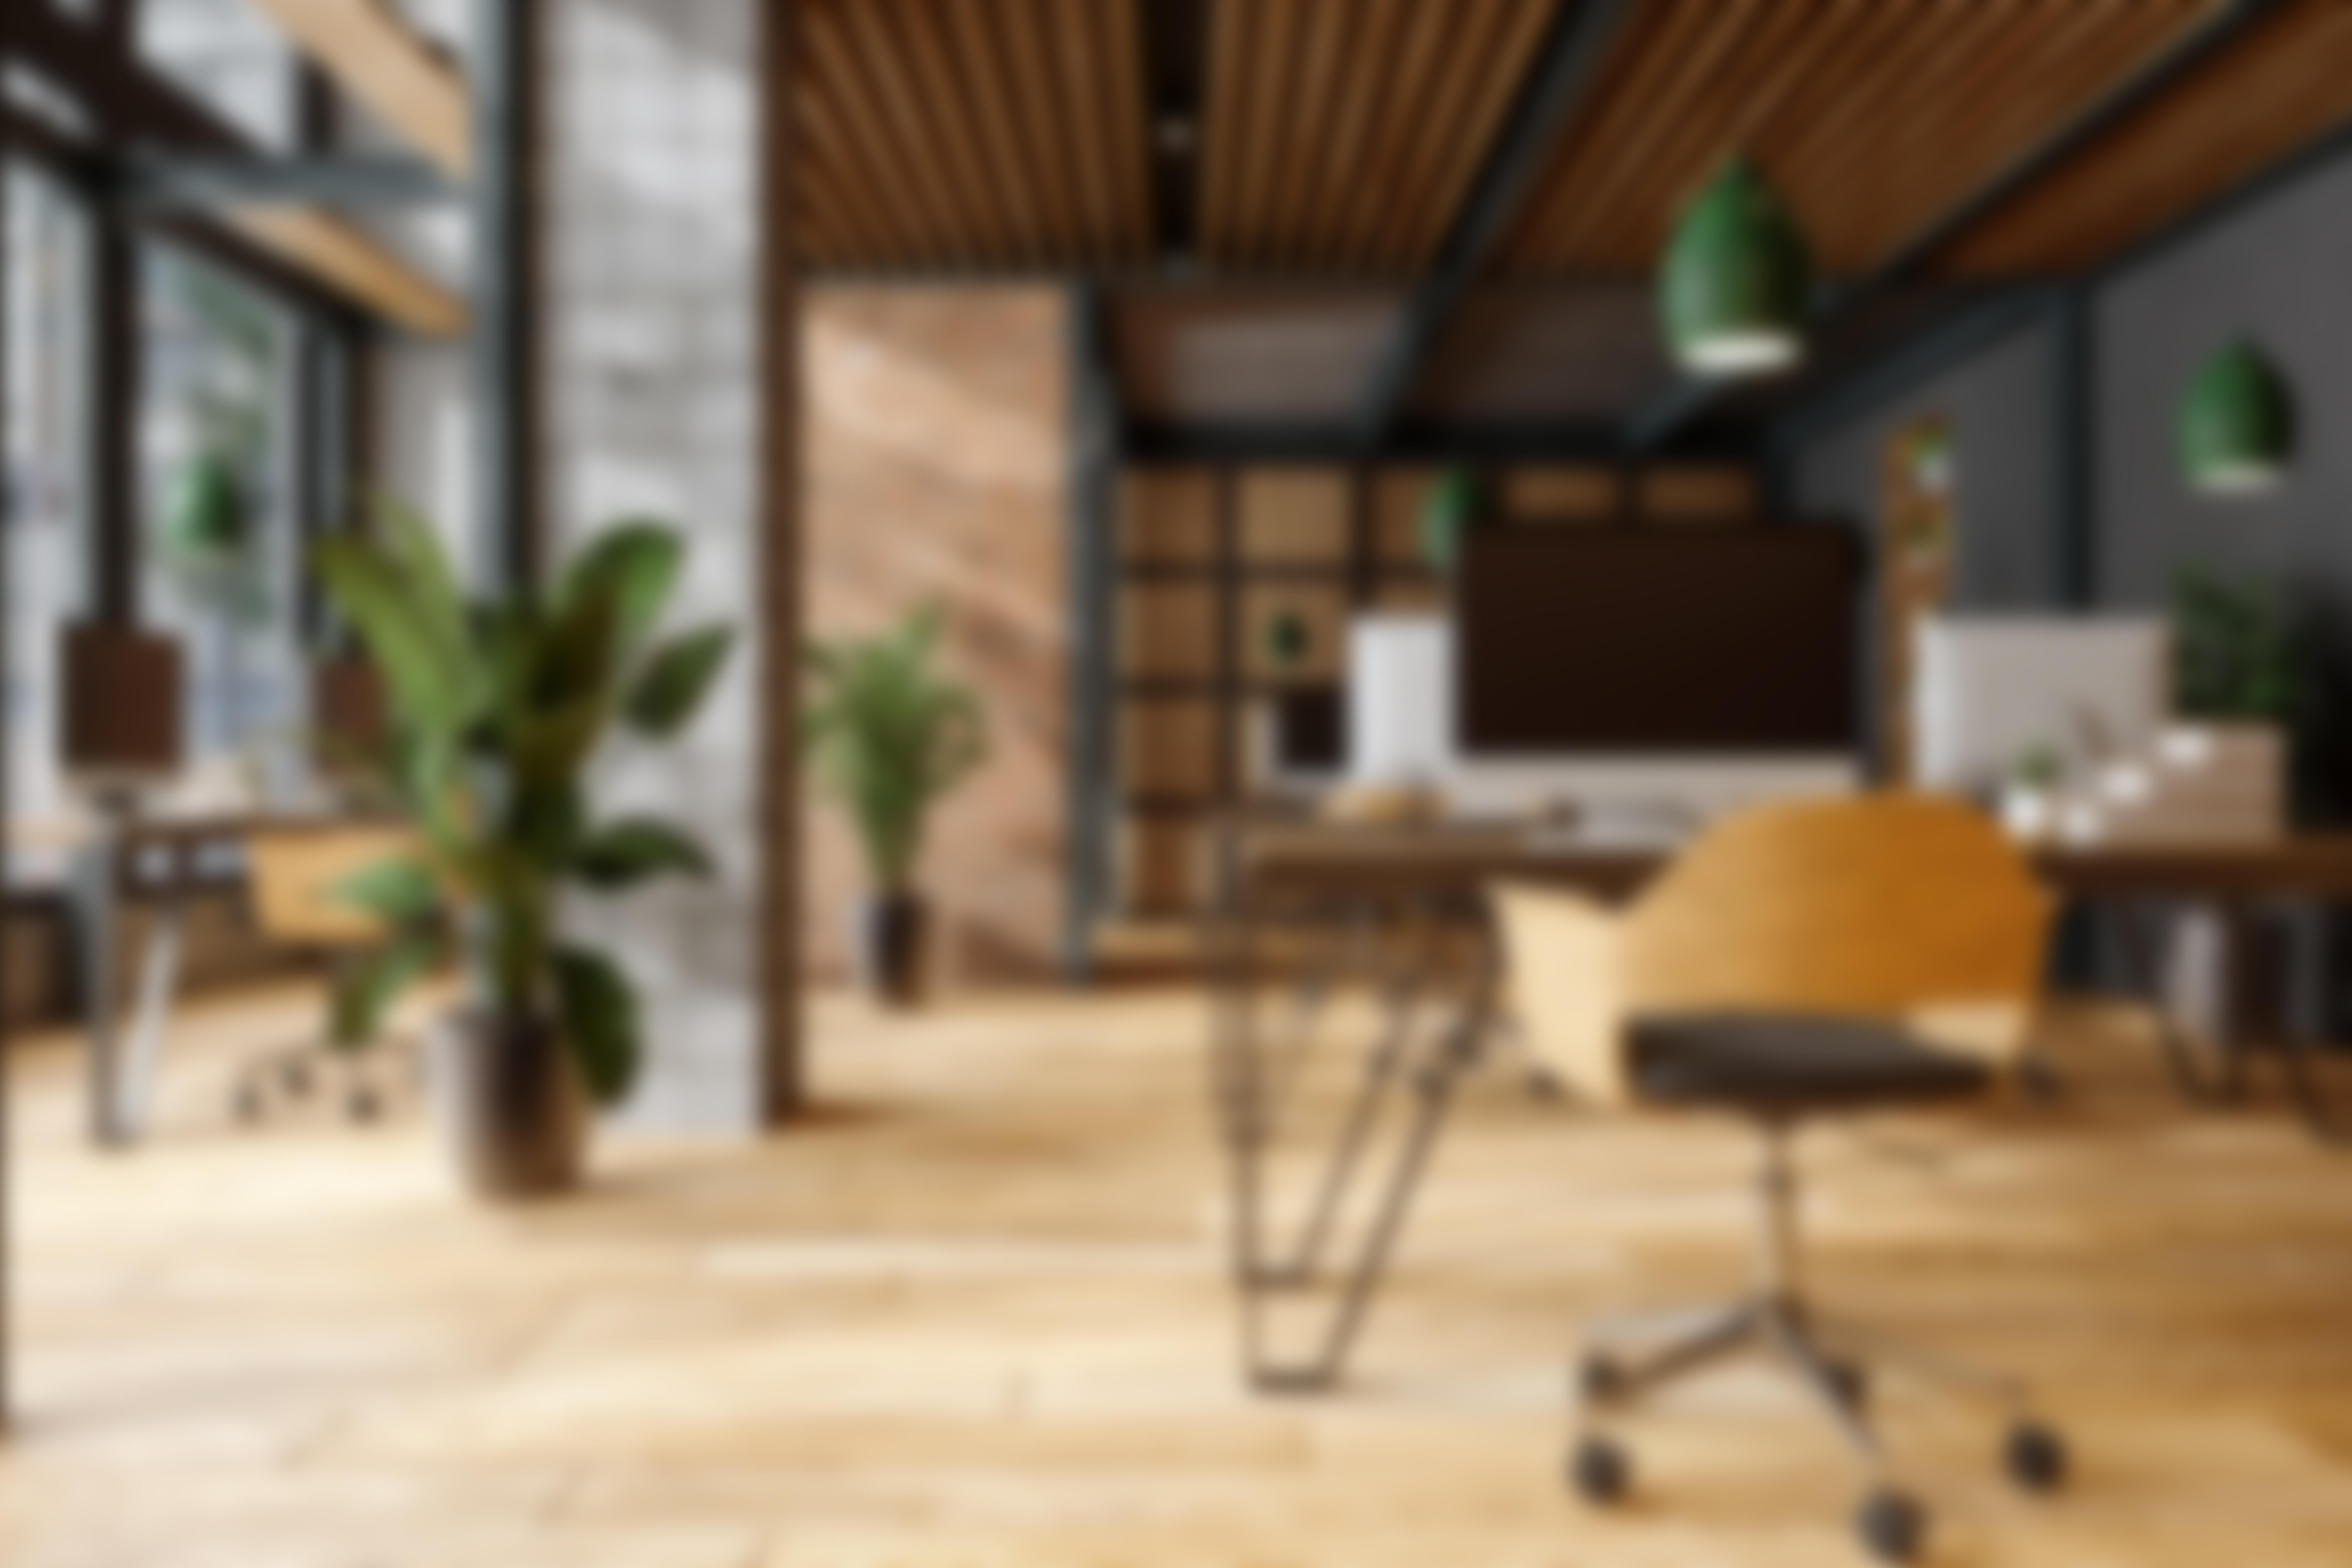 office blur image